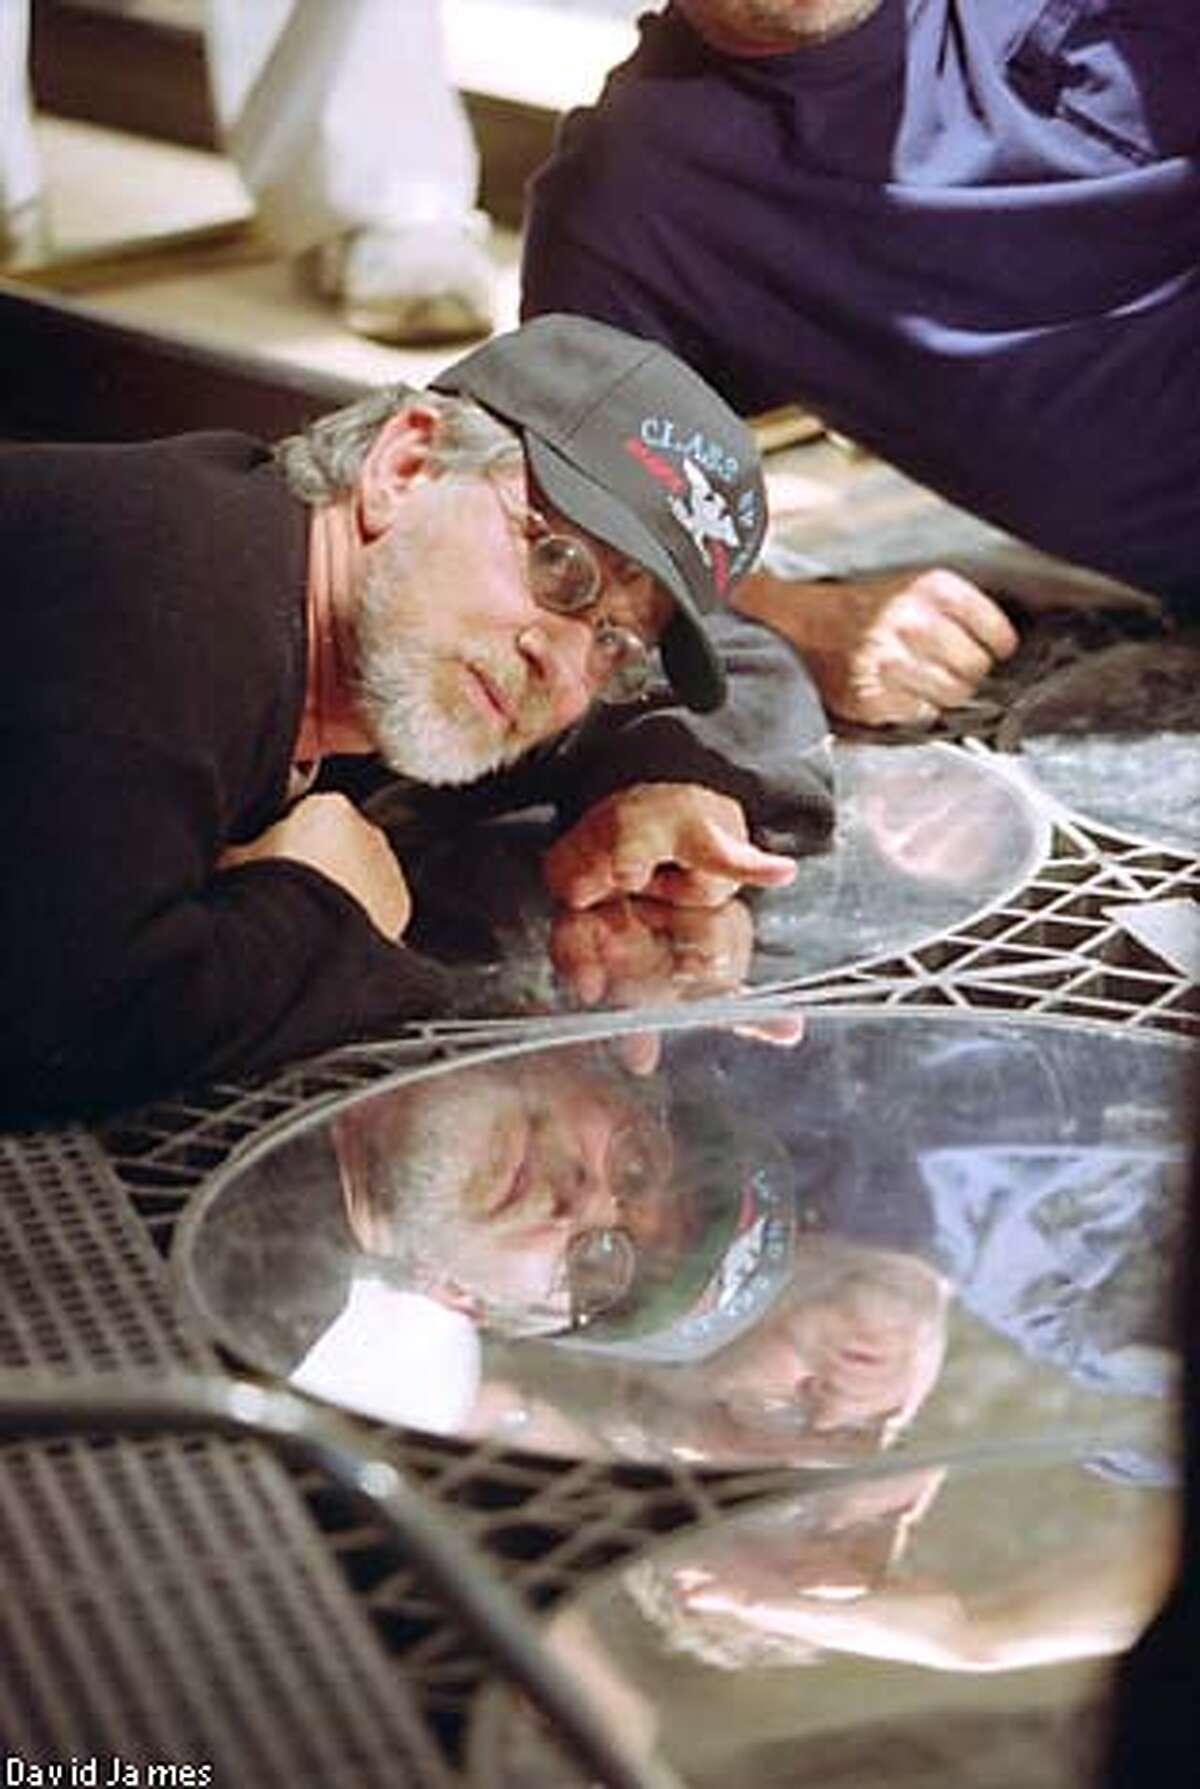 Steven Spielberg on directing